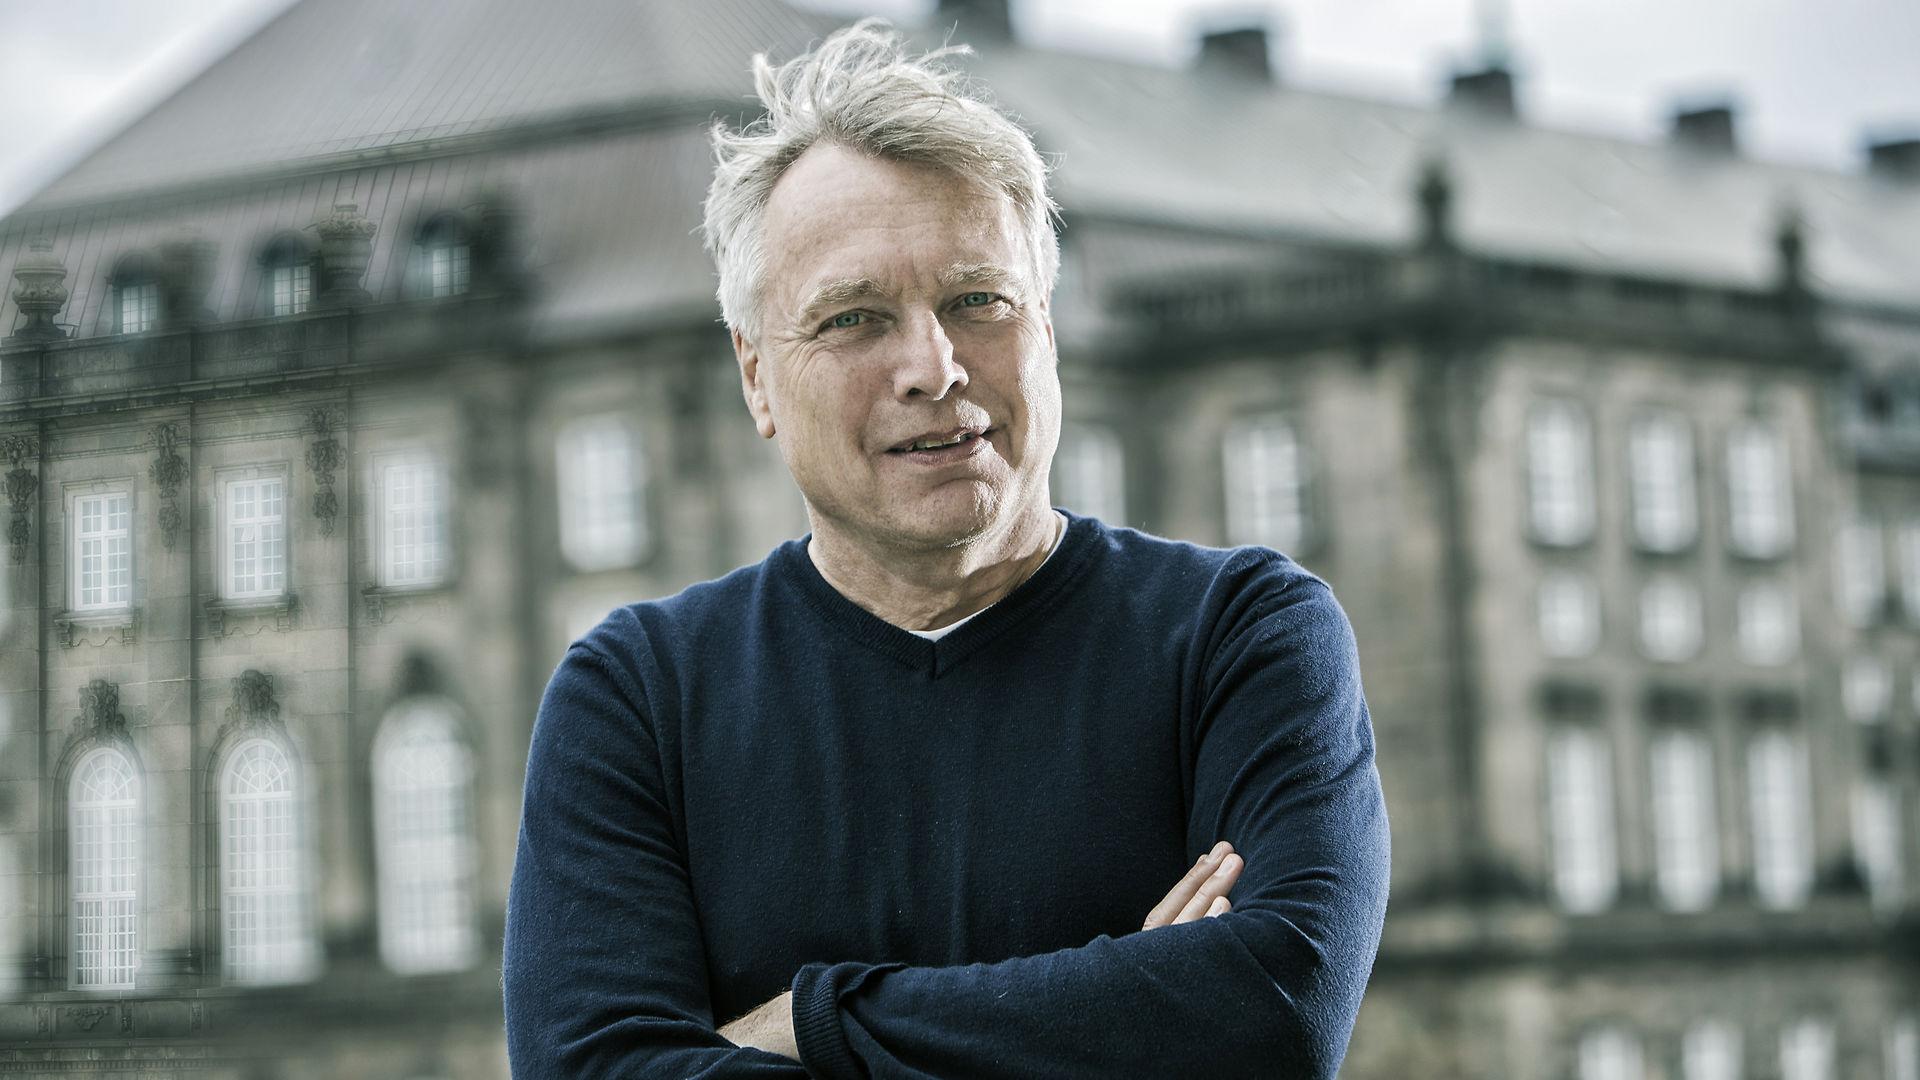 Uffe Elbæk: Først gjorde vi klimakrisen mainstream. Nu vil vi slå blokpolitikken ihjel